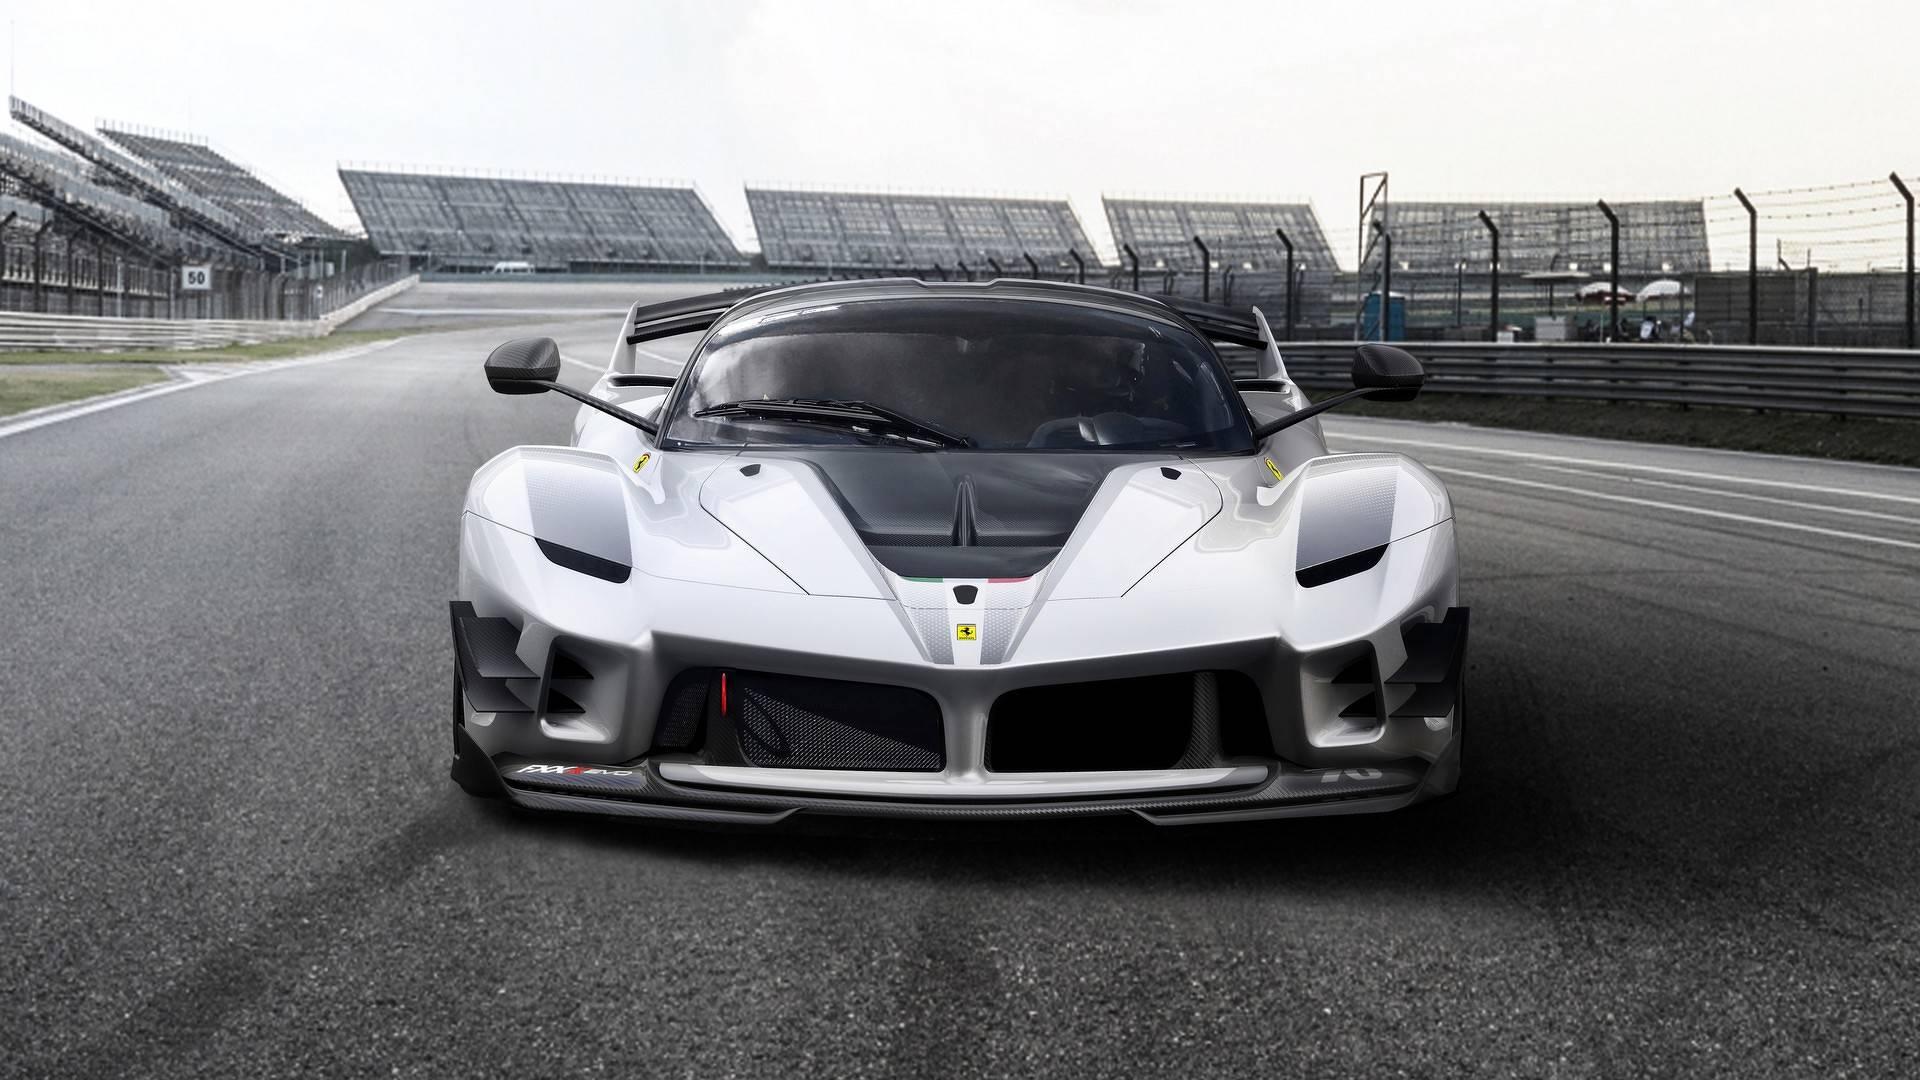 Ferrari Mostra Brutal Fxx K Evo De Corrida Em Mugello